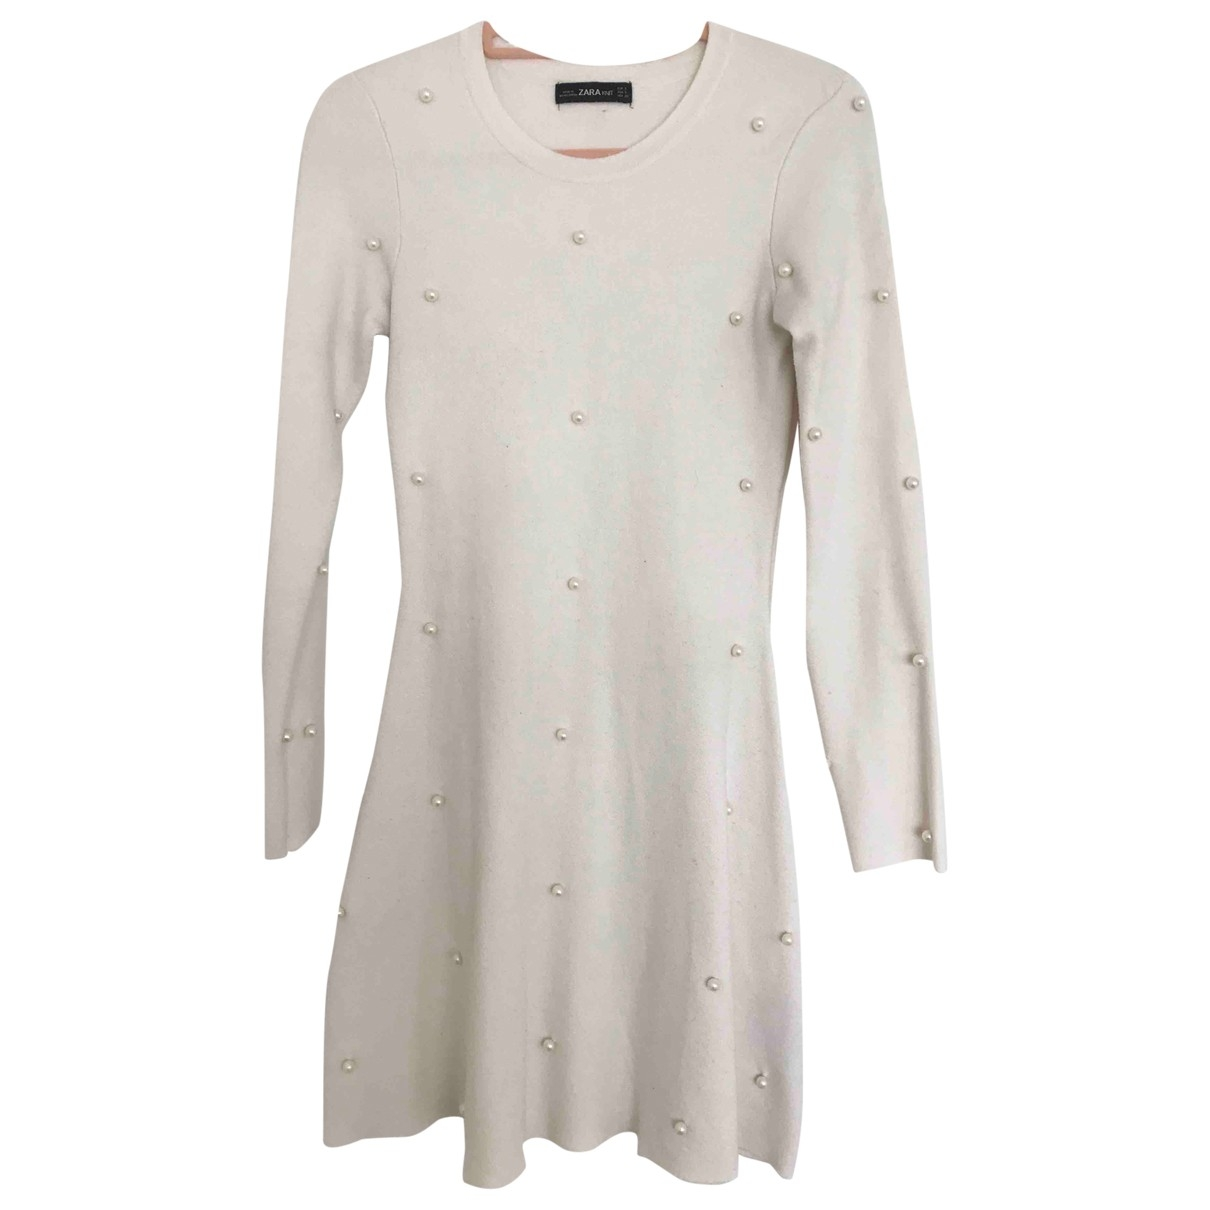 Zara \N Ecru dress for Women S International